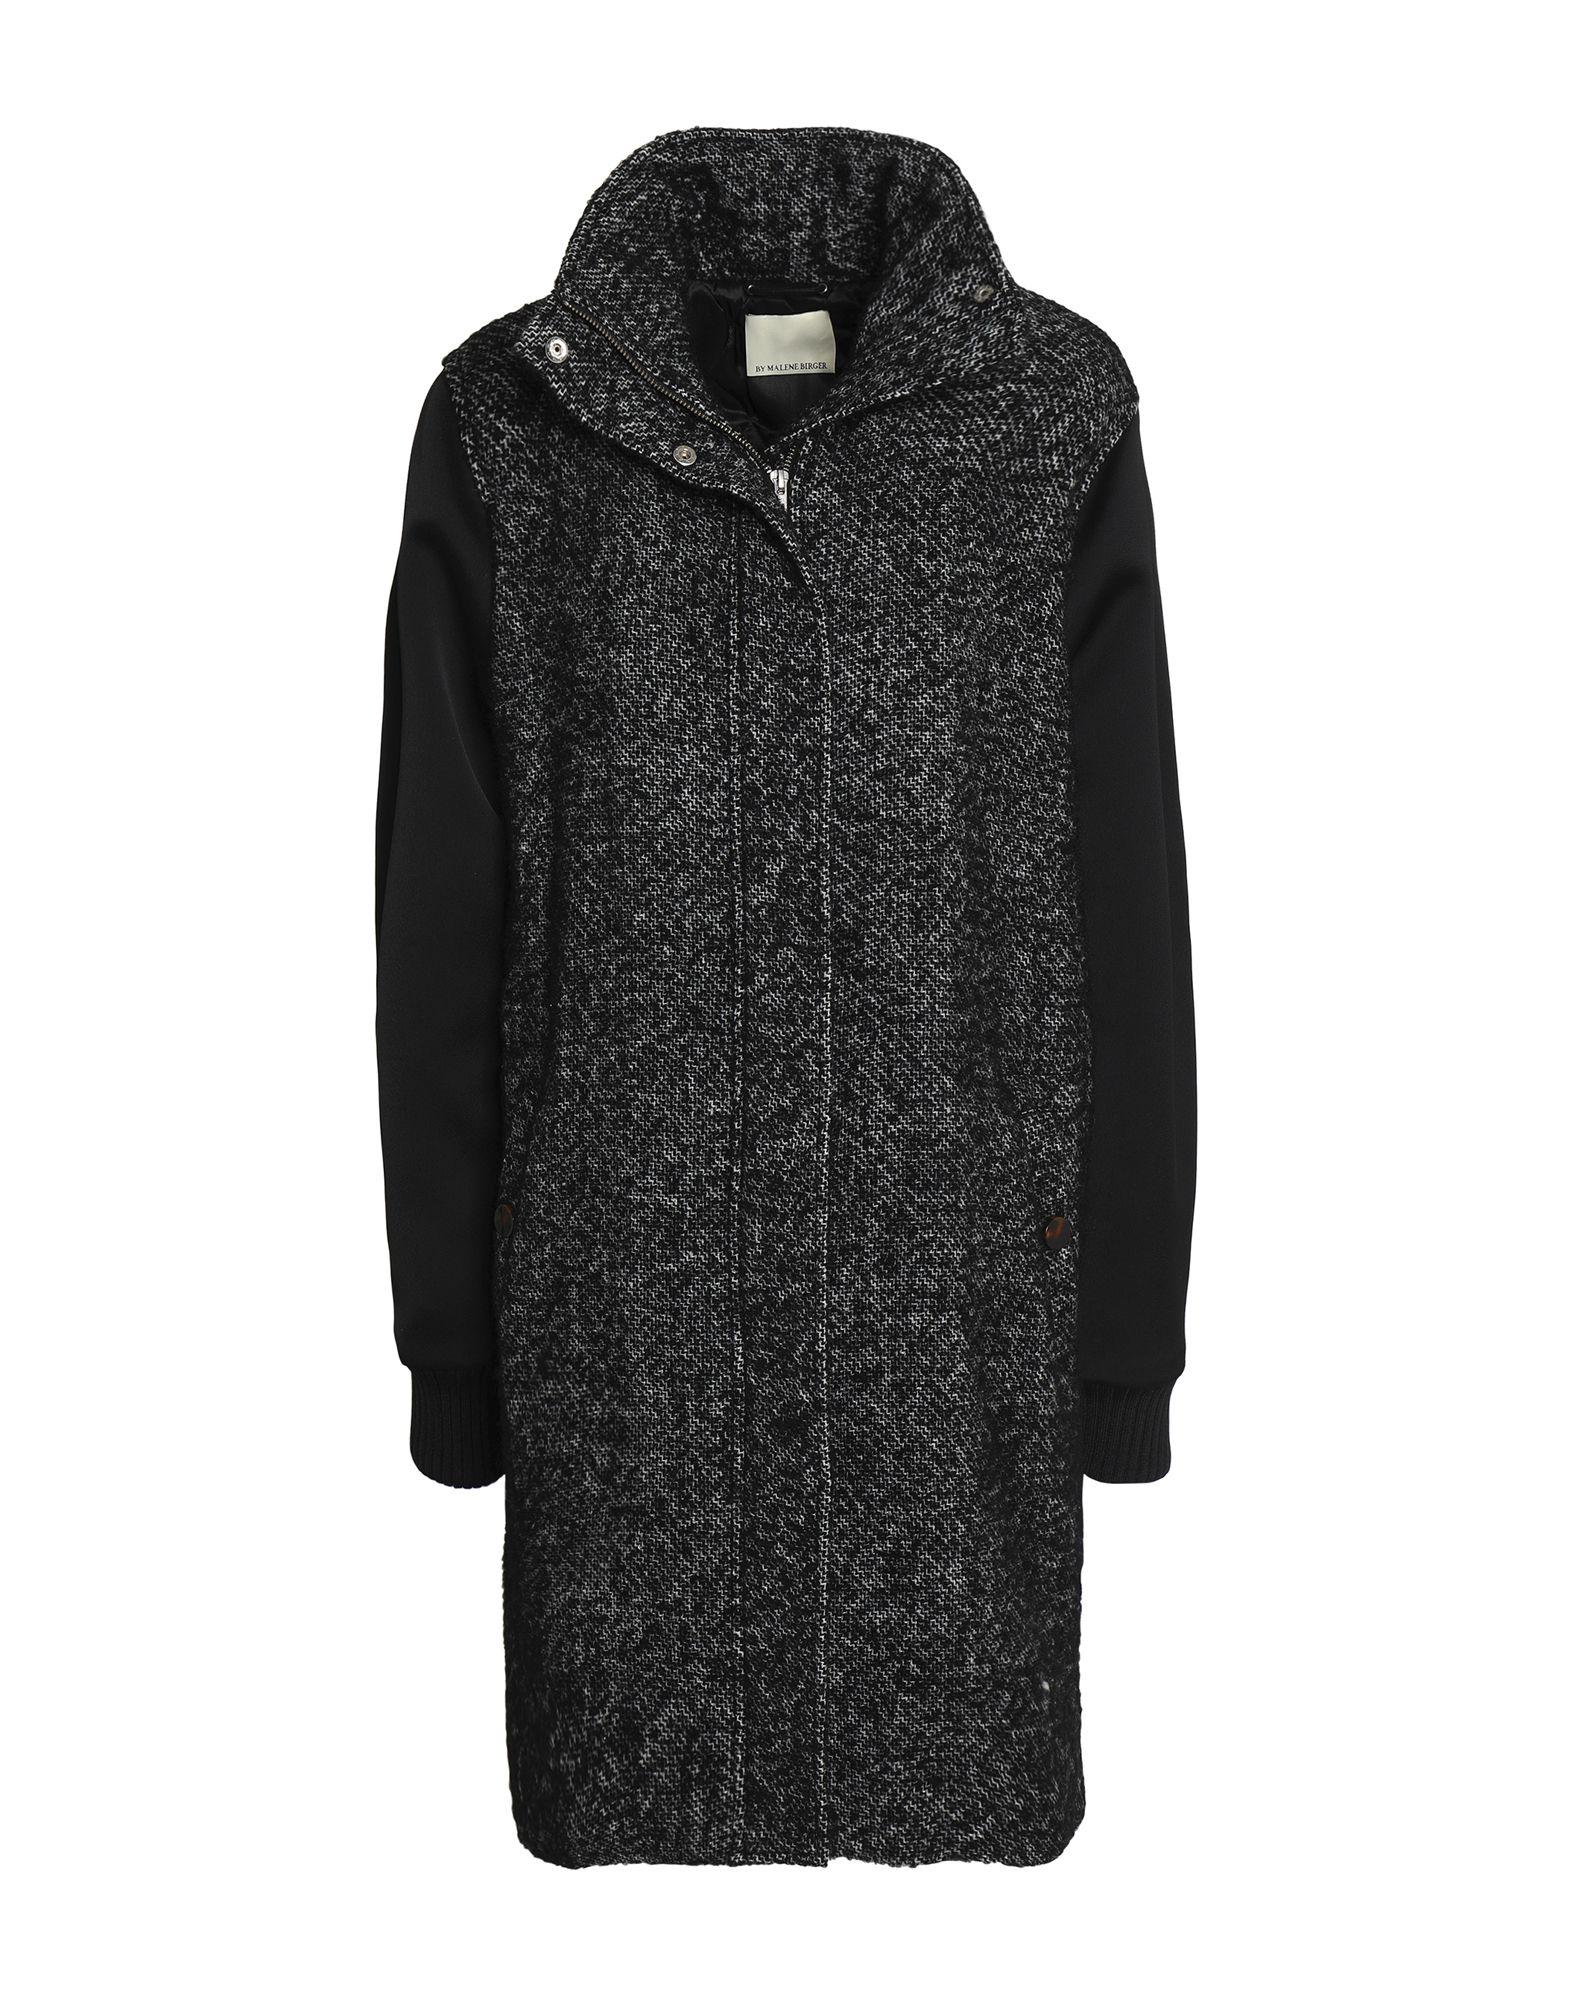 BY MALENE BIRGER Пальто by malene birger пальто